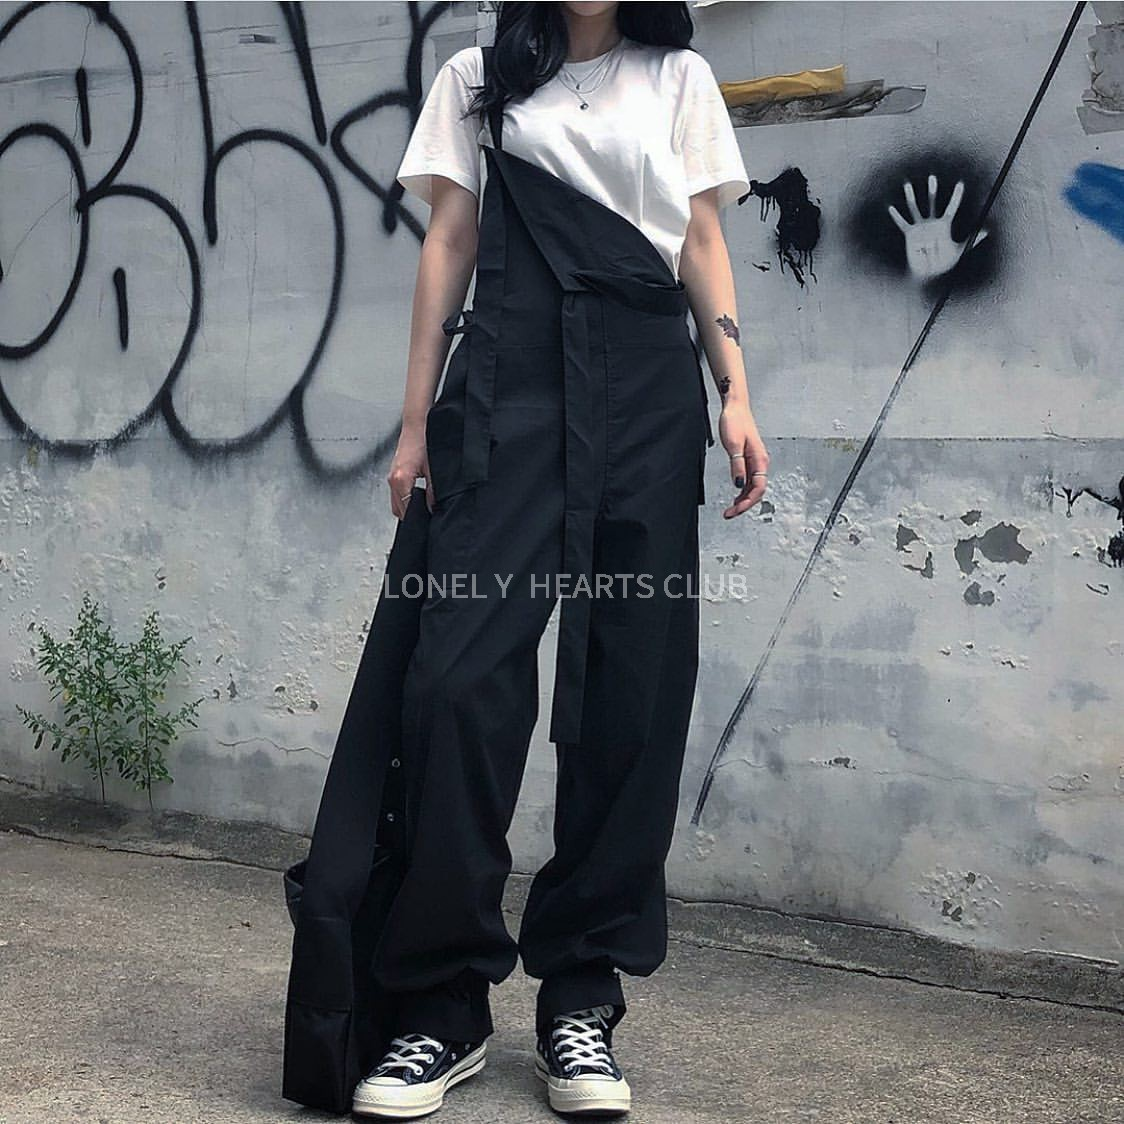 lonelyheartsclub .定制黑白连体裤12-02新券